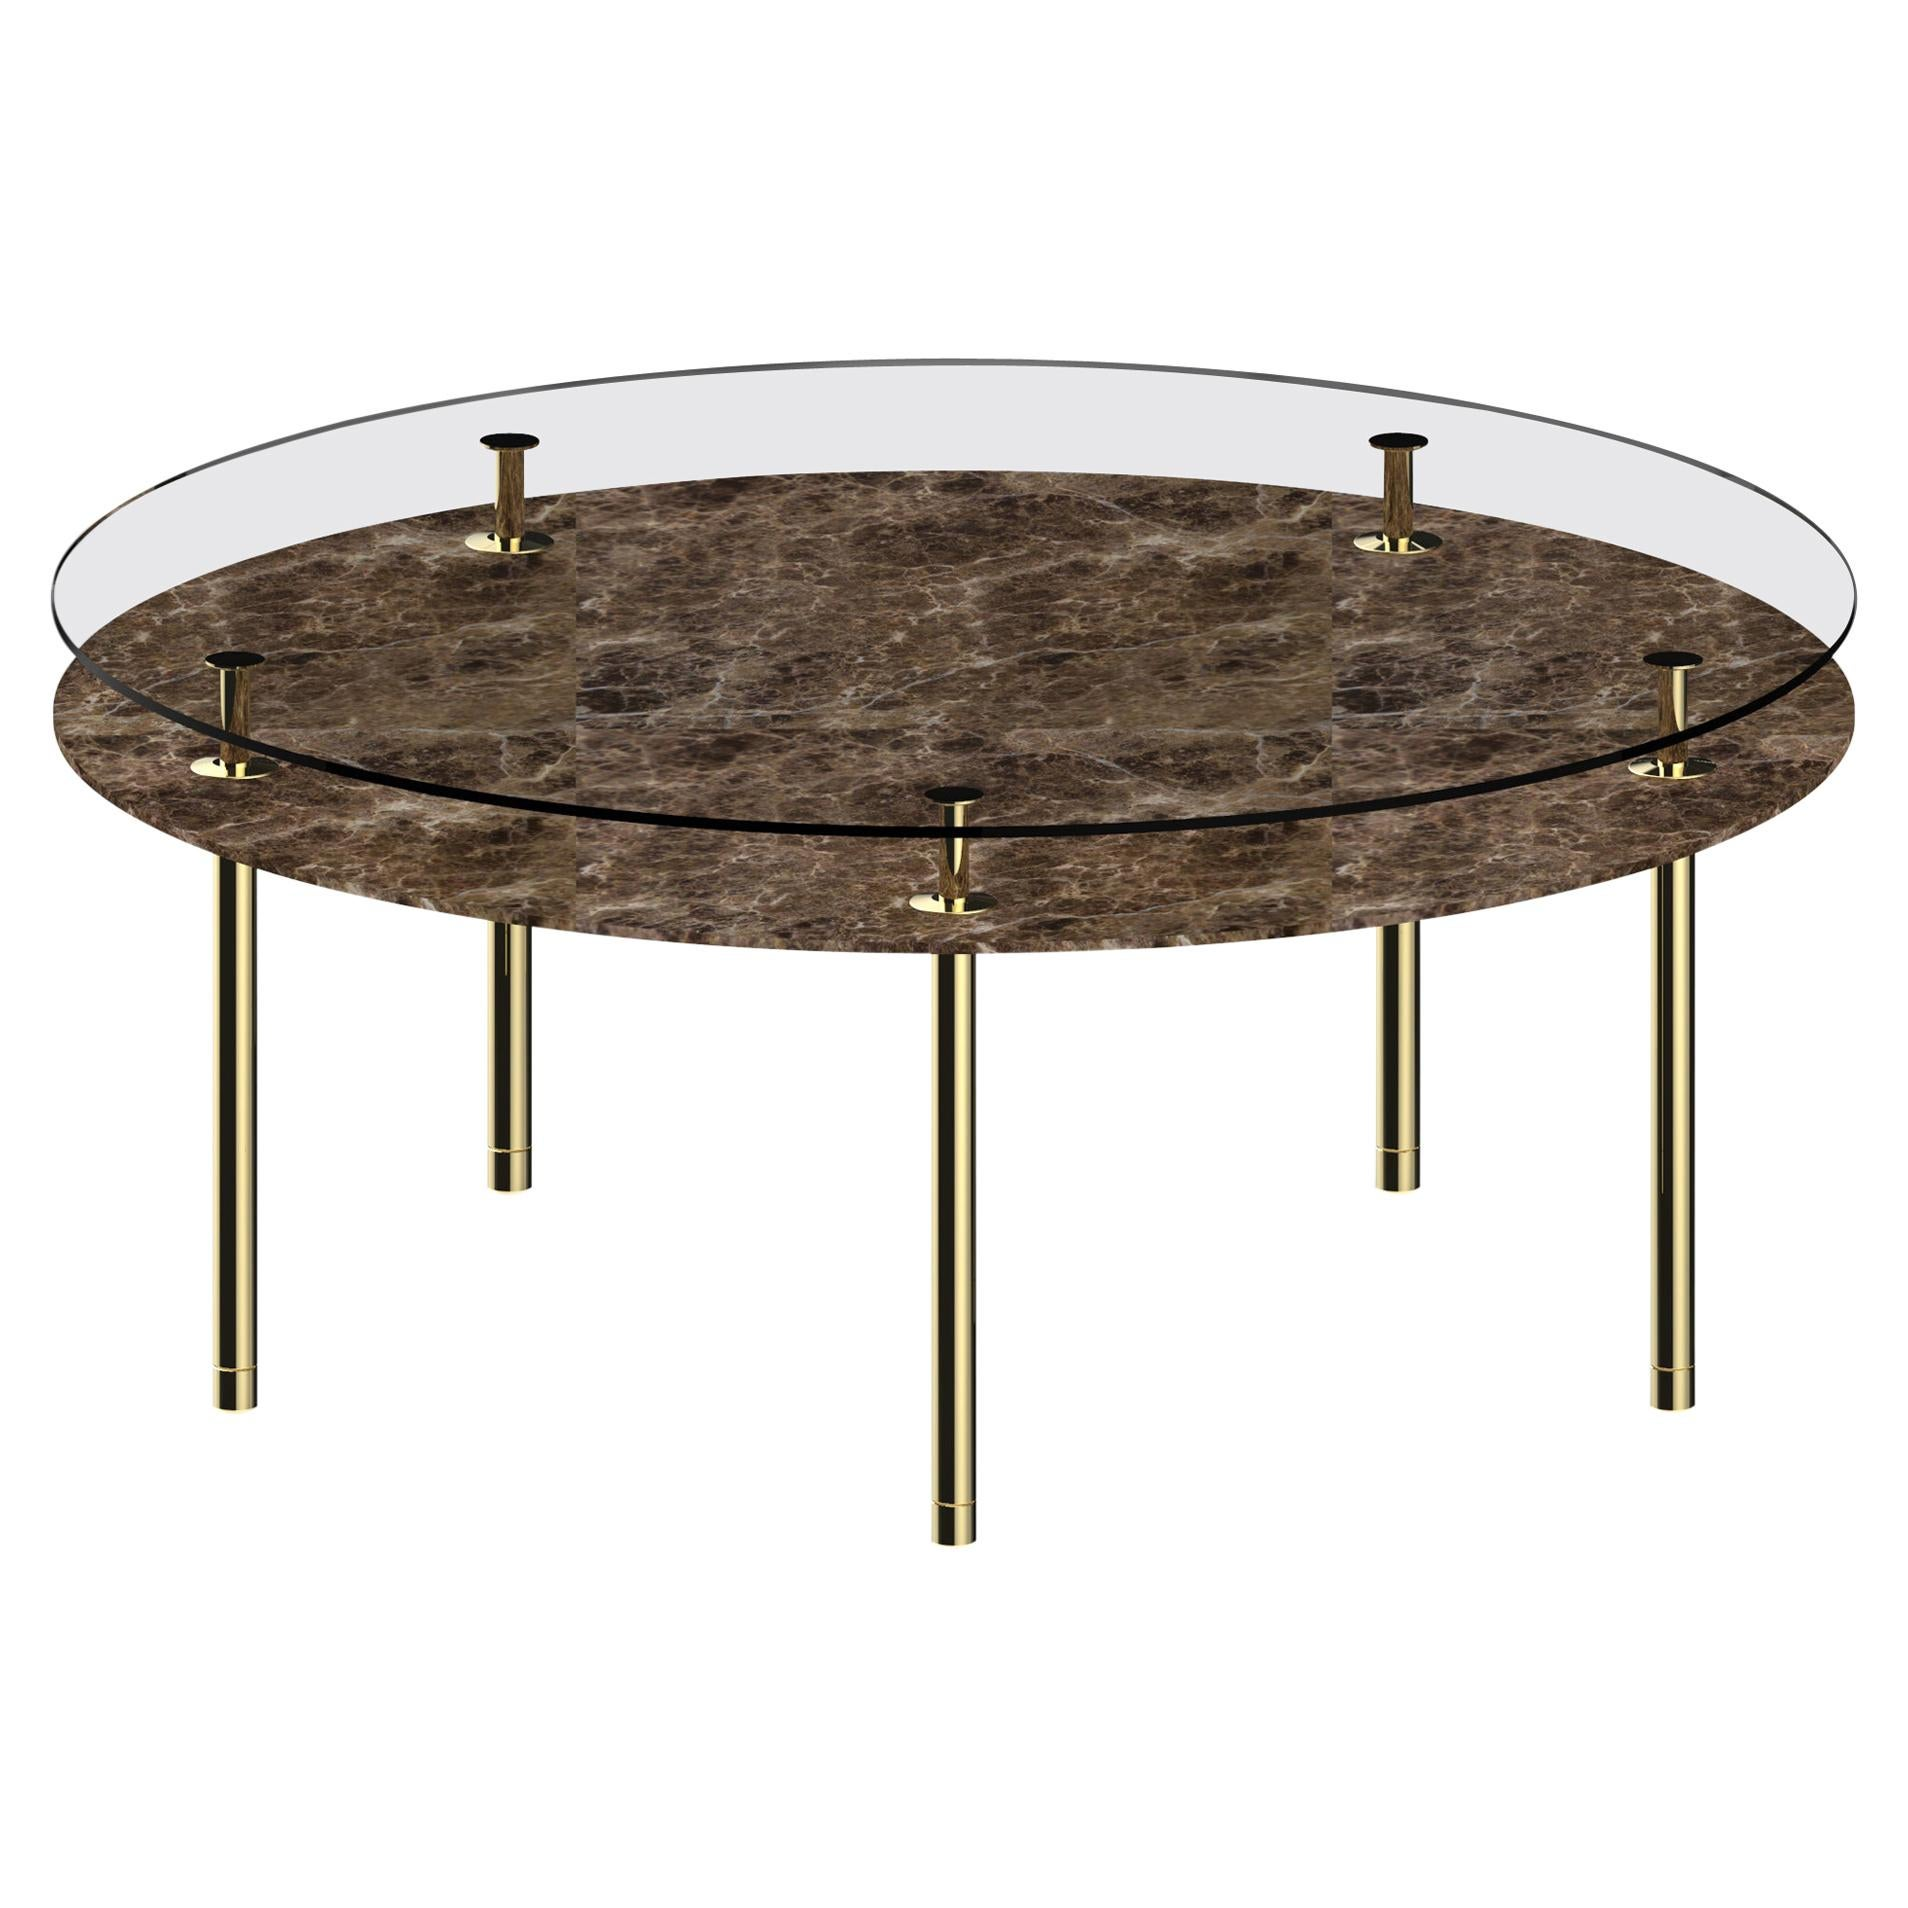 Ghidini 1961 Legs Round Table with Emperador Dark Marble Top by Paolo Rizzatto